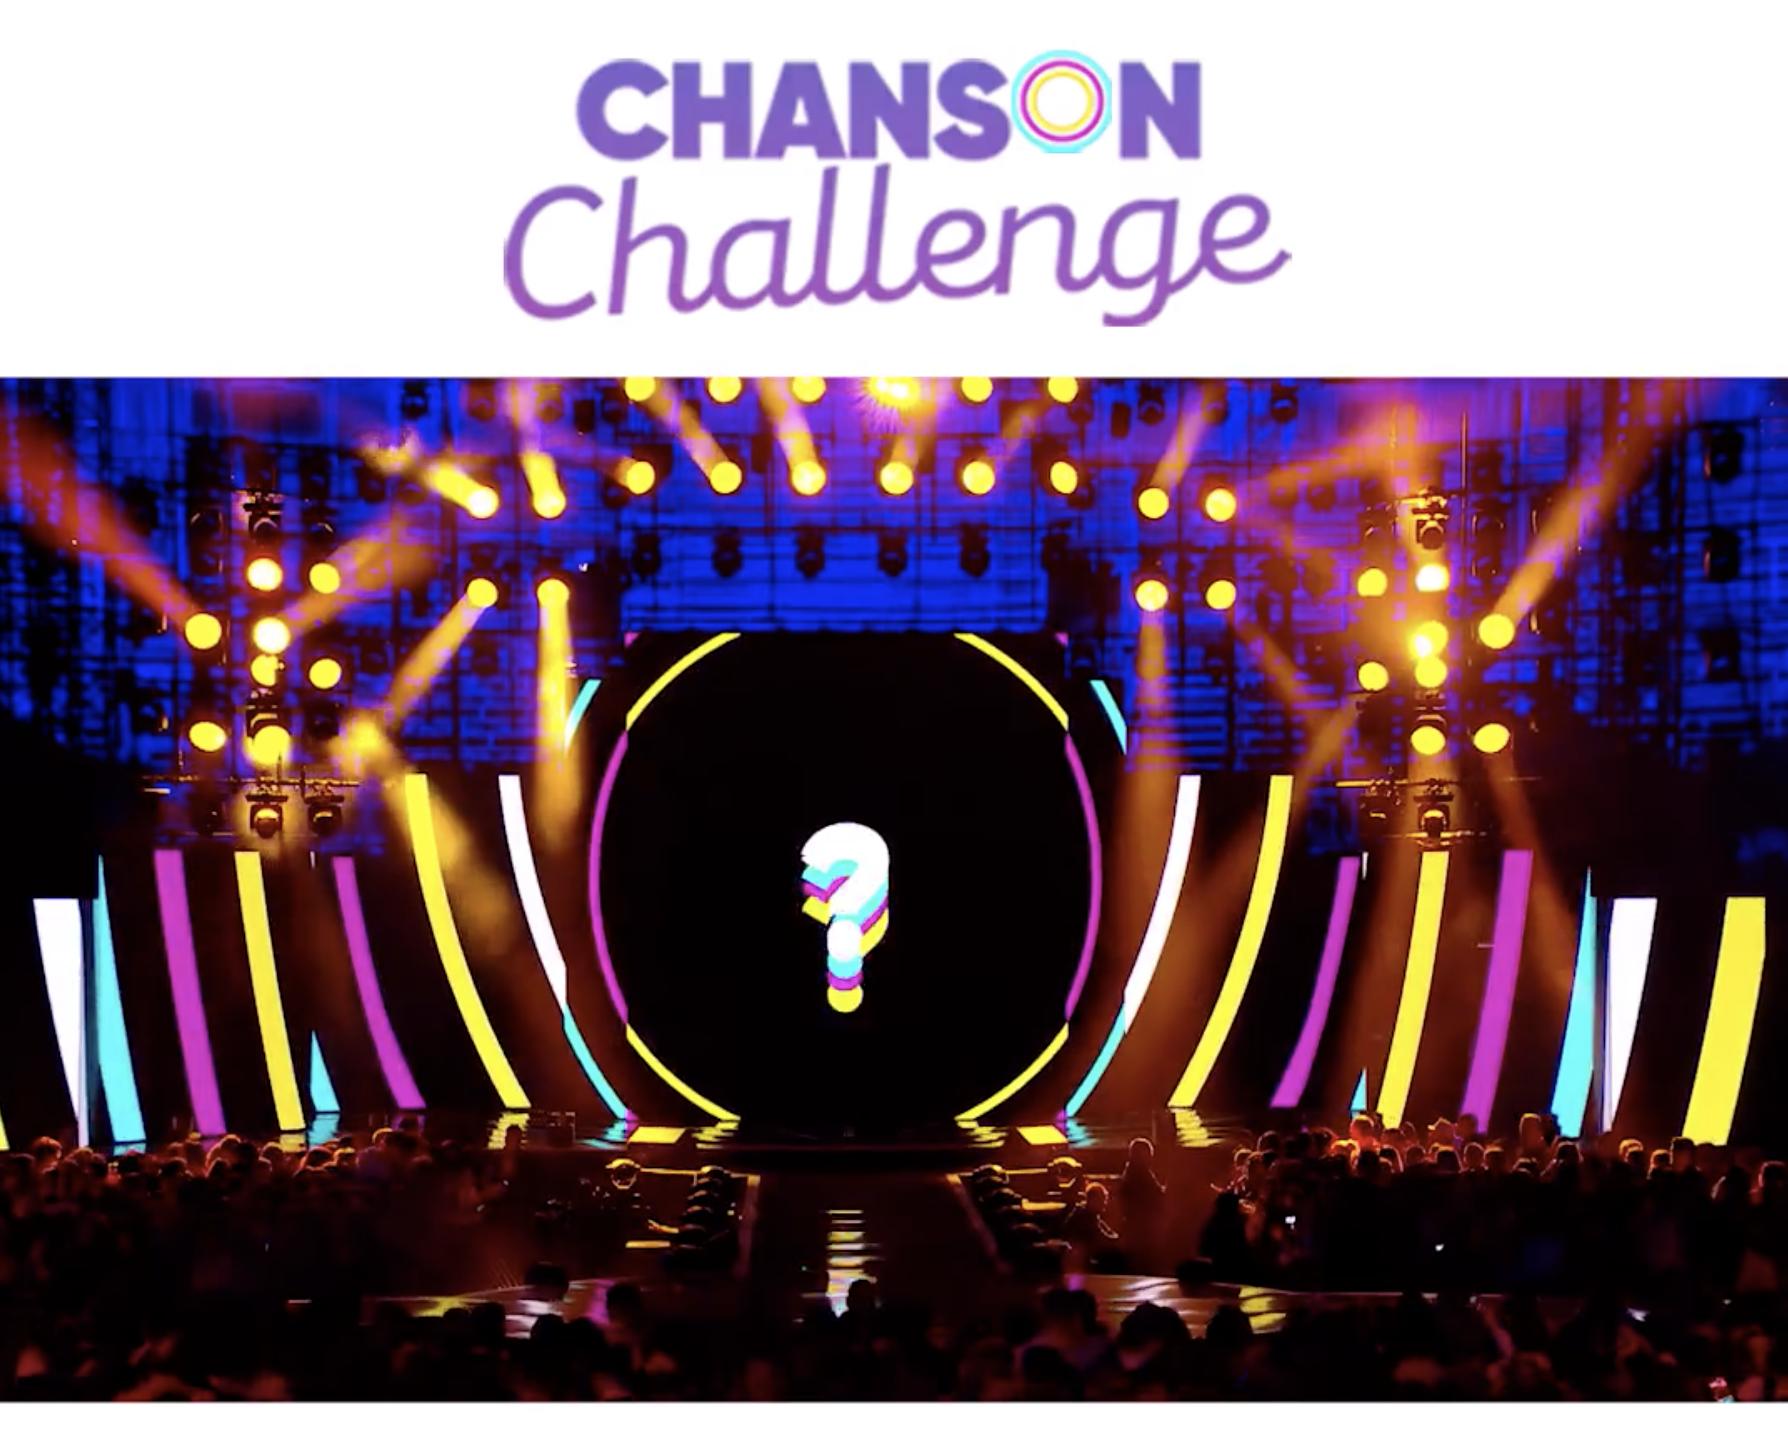 Chanson Challenge - La Chanson Challenge - TF1 - Arènes de Nîmes